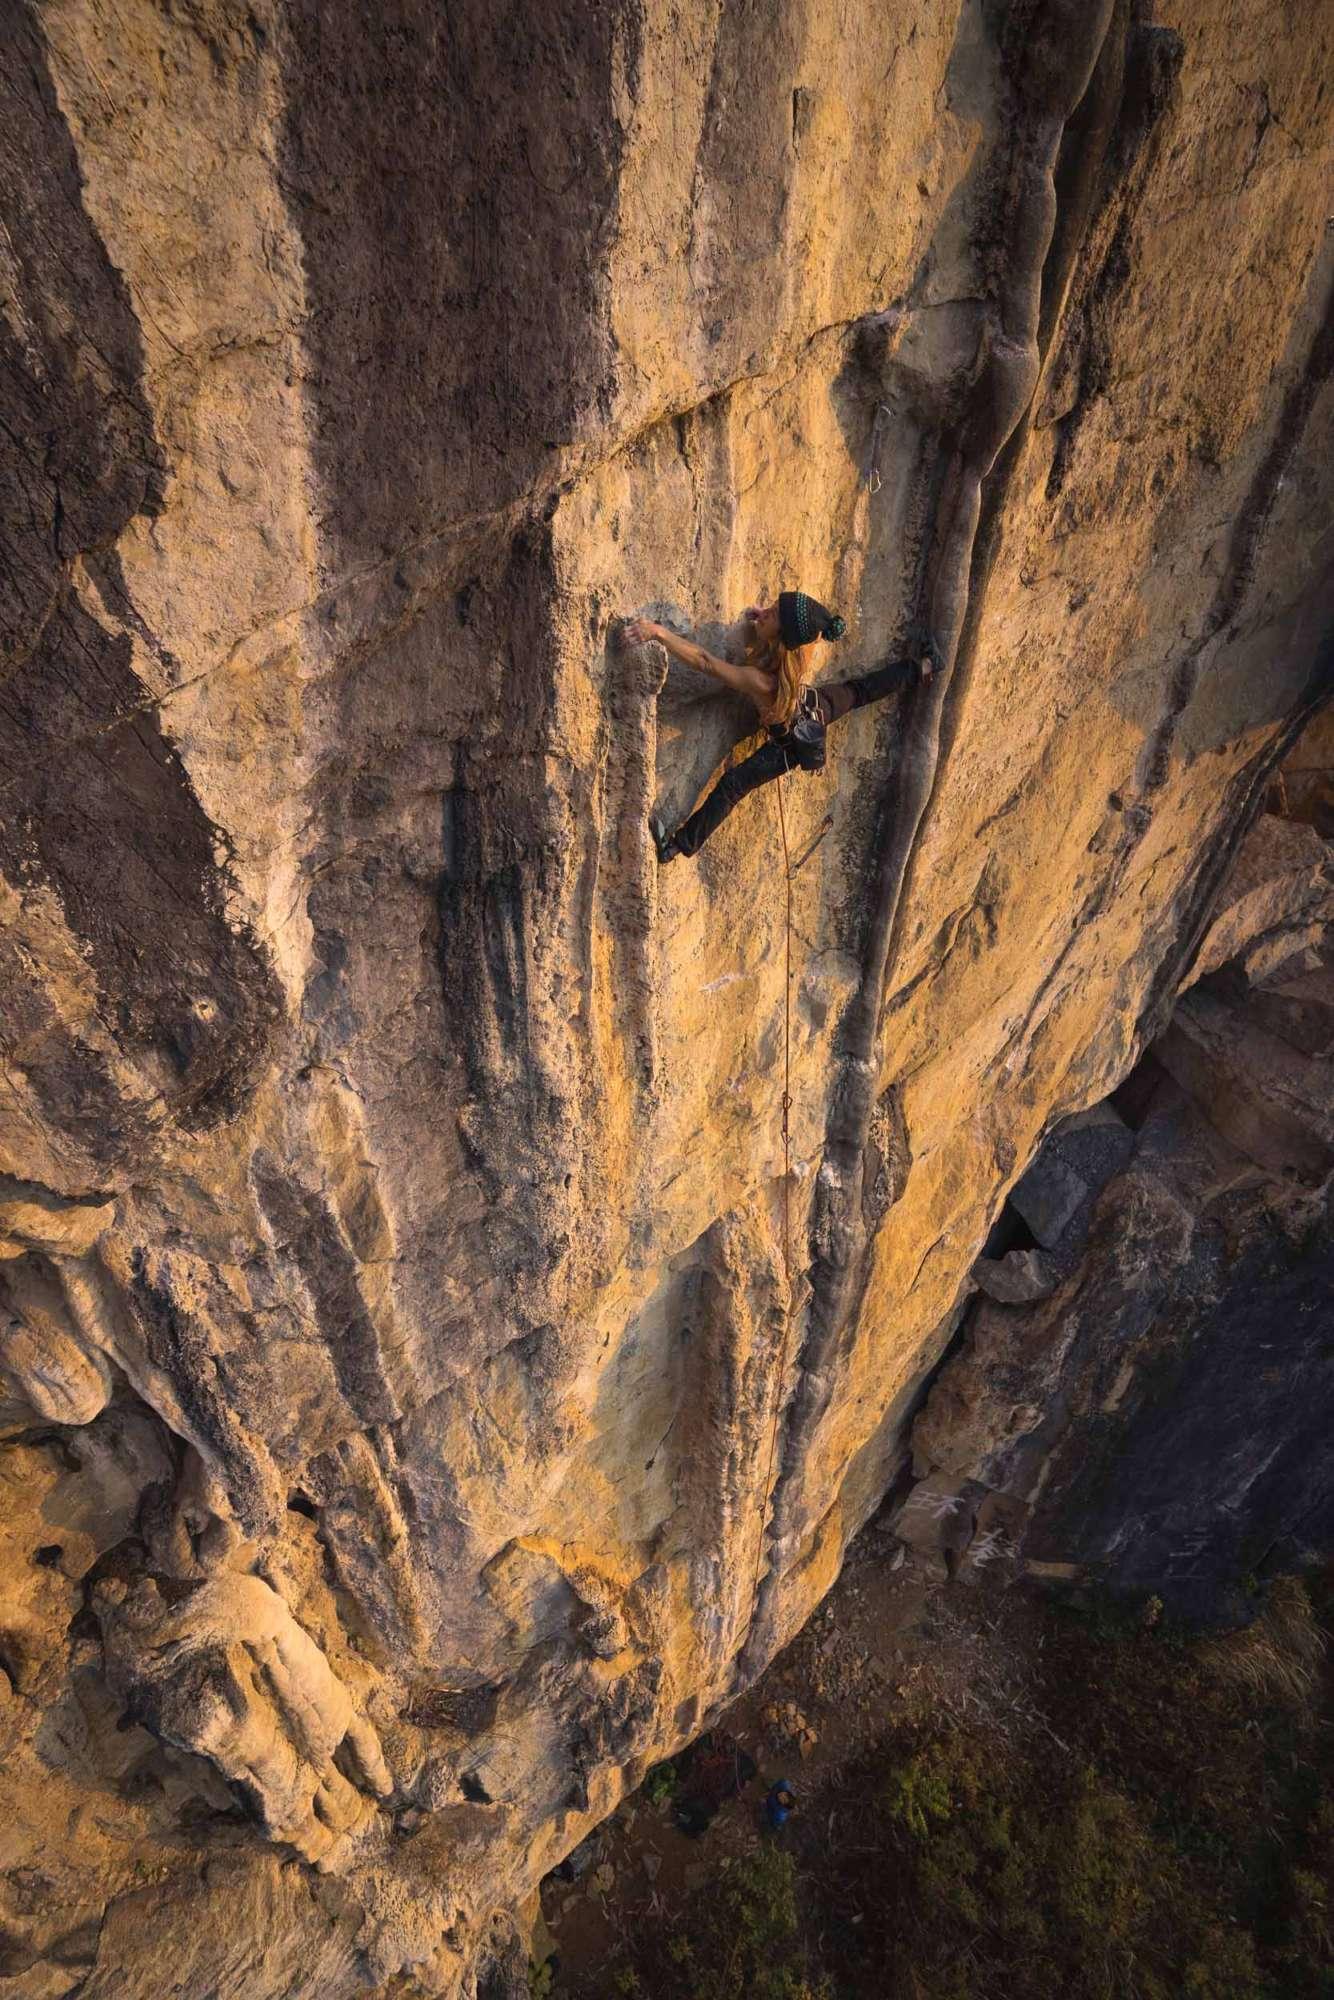 mountain-climbers-soaring-to-new-heights-photographer-Jan-Novak-vie-en-montagne-Emilie-Pellerin-Next-Move